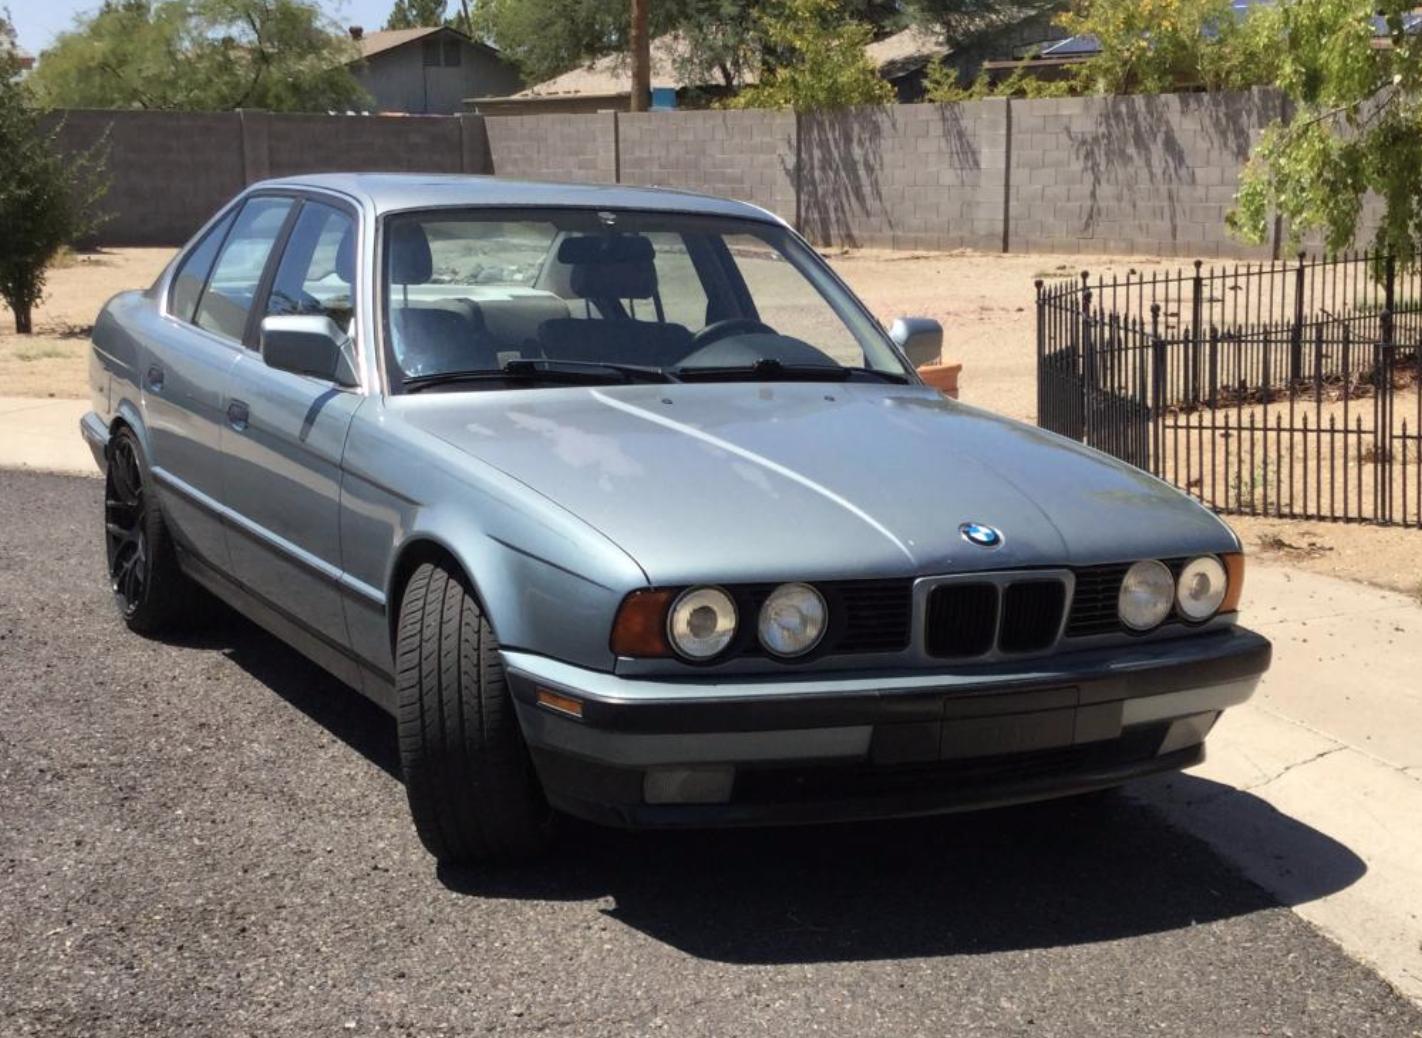 hey, new BMW fan here